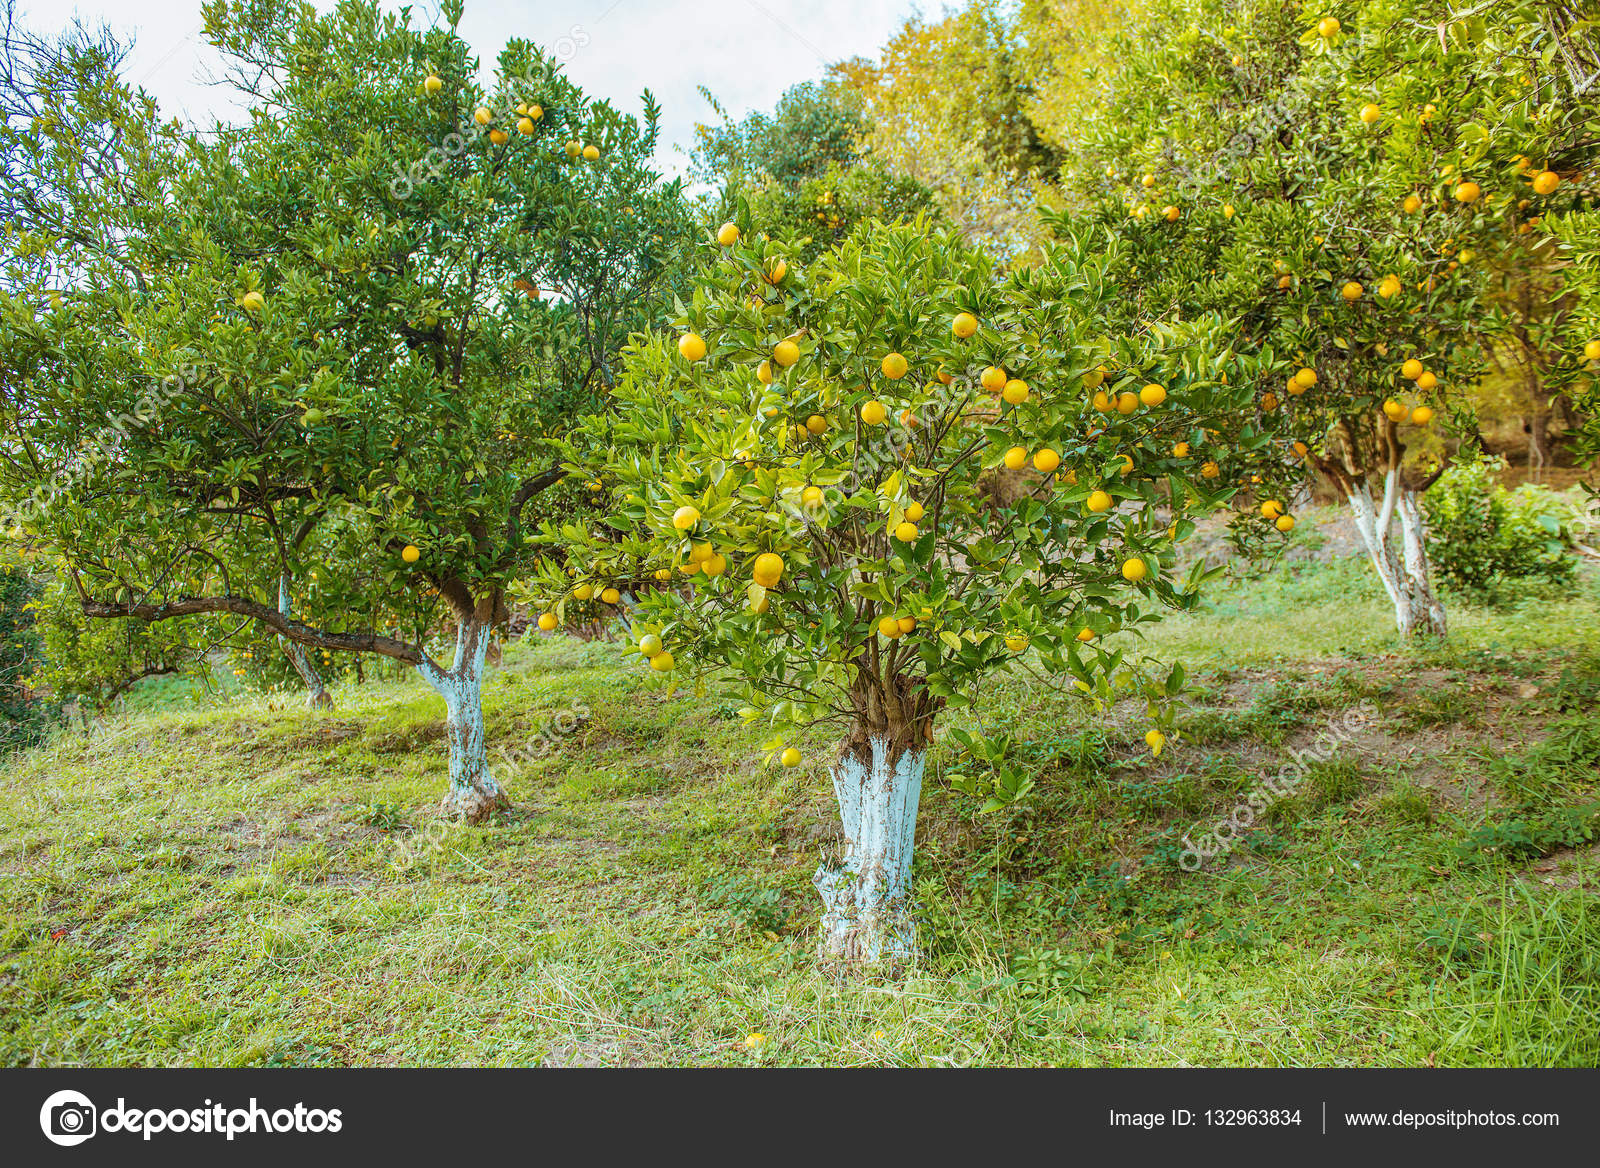 Bomen In Tuin : Oranje bomen in de tuin u2014 stockfoto © nata lunatad #132963834